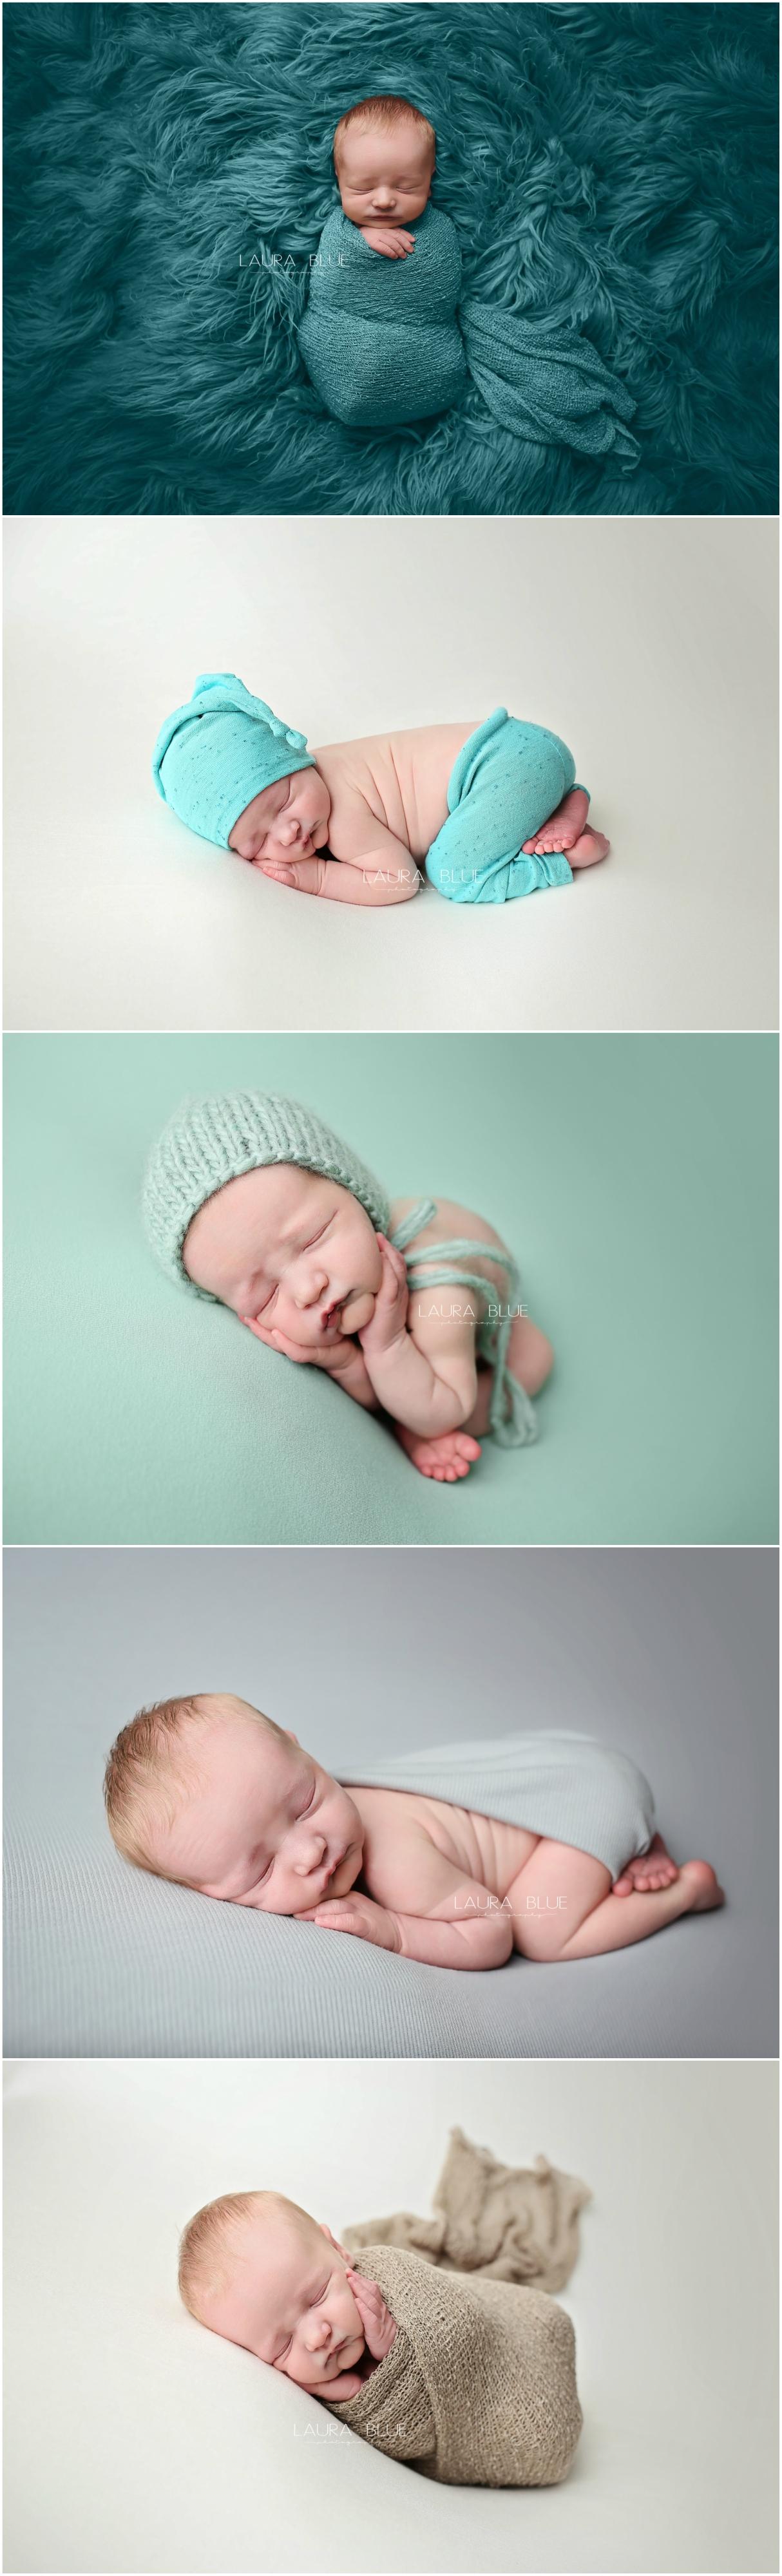 Newborn photography san tan valley arizona newborn photographer laura blue photography